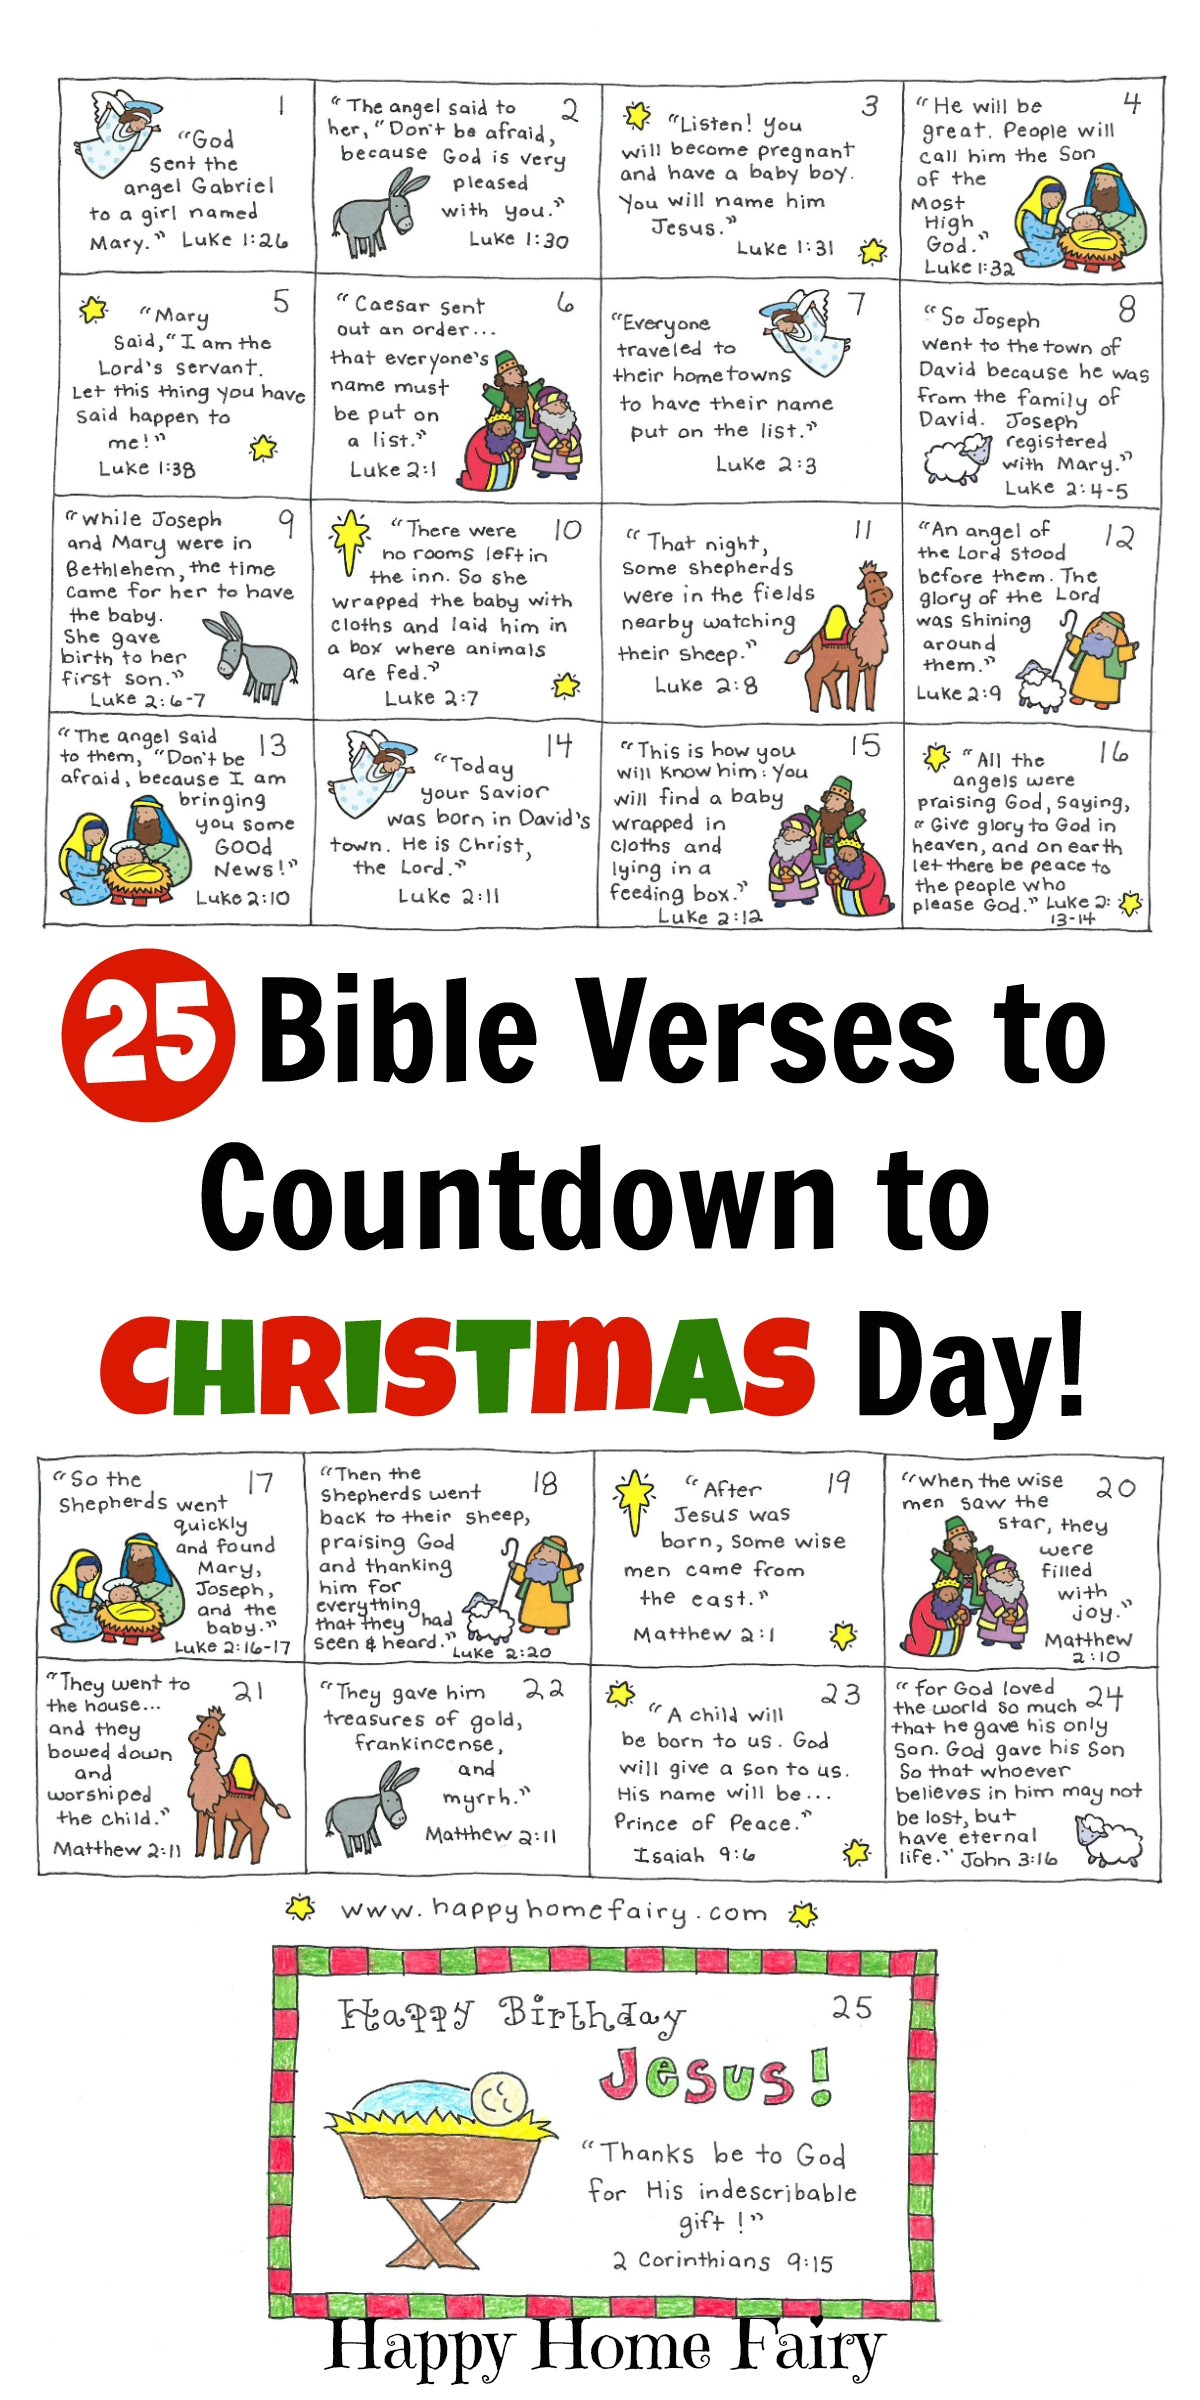 25 bible verses to countdown to christmas jpg